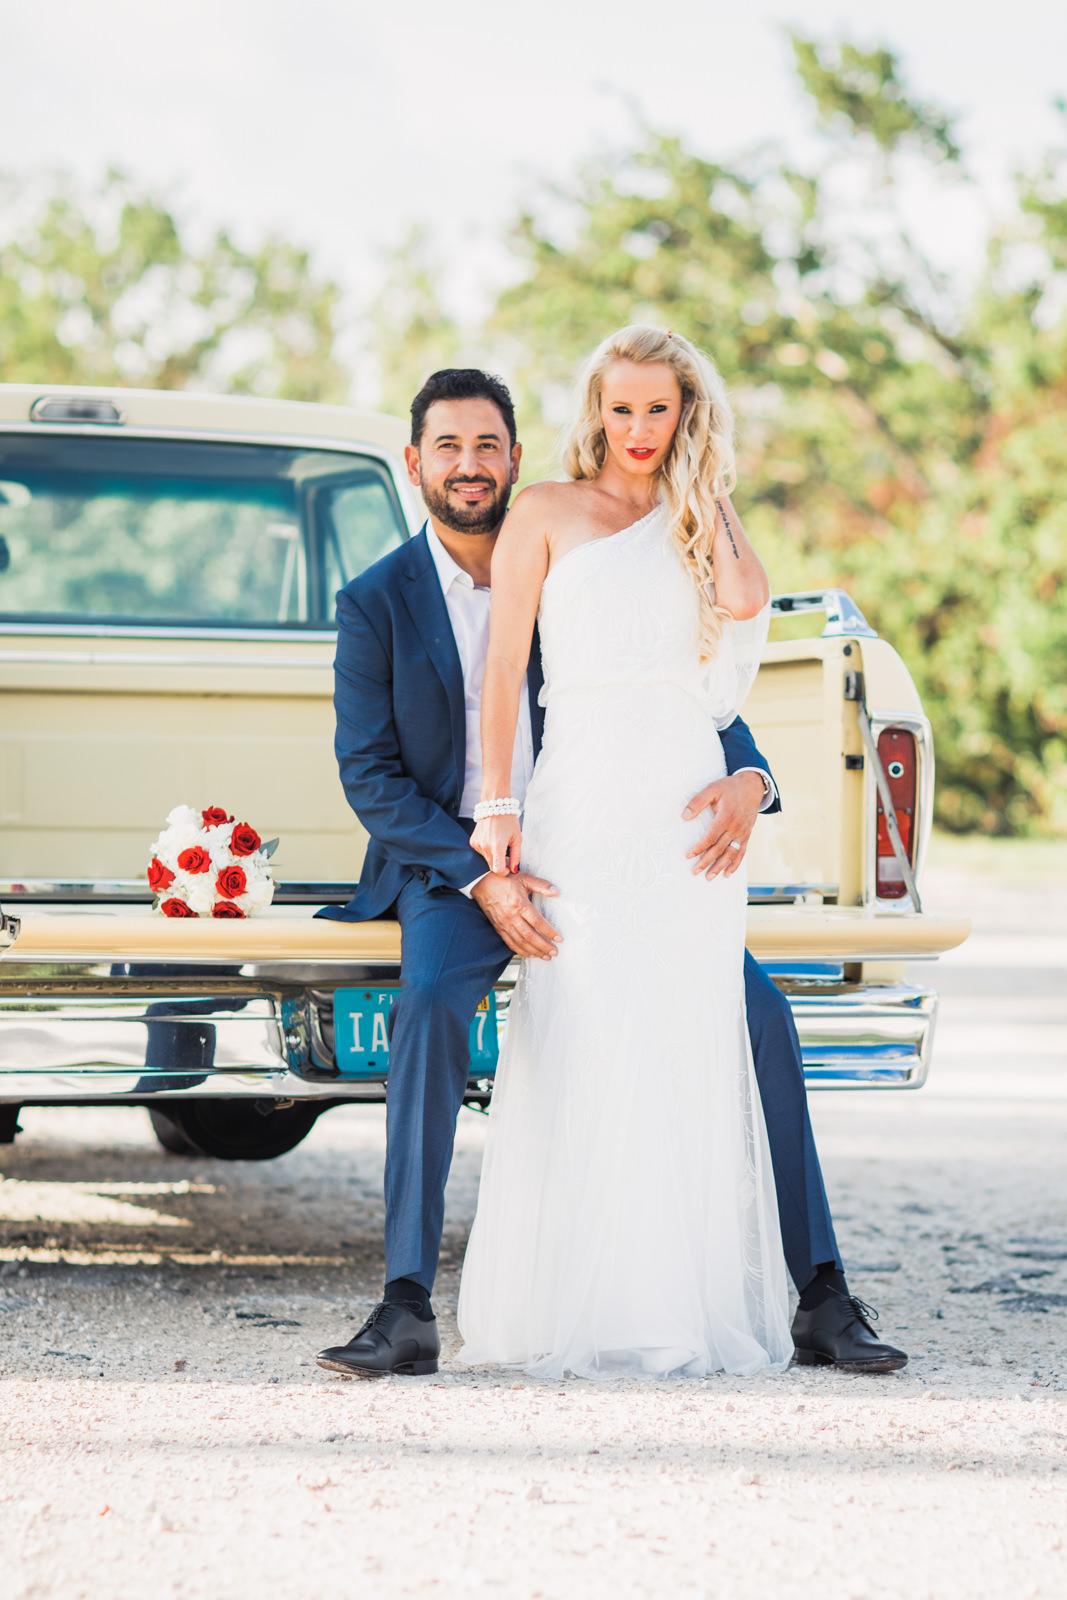 ford 1972 pickup truck wedding photos